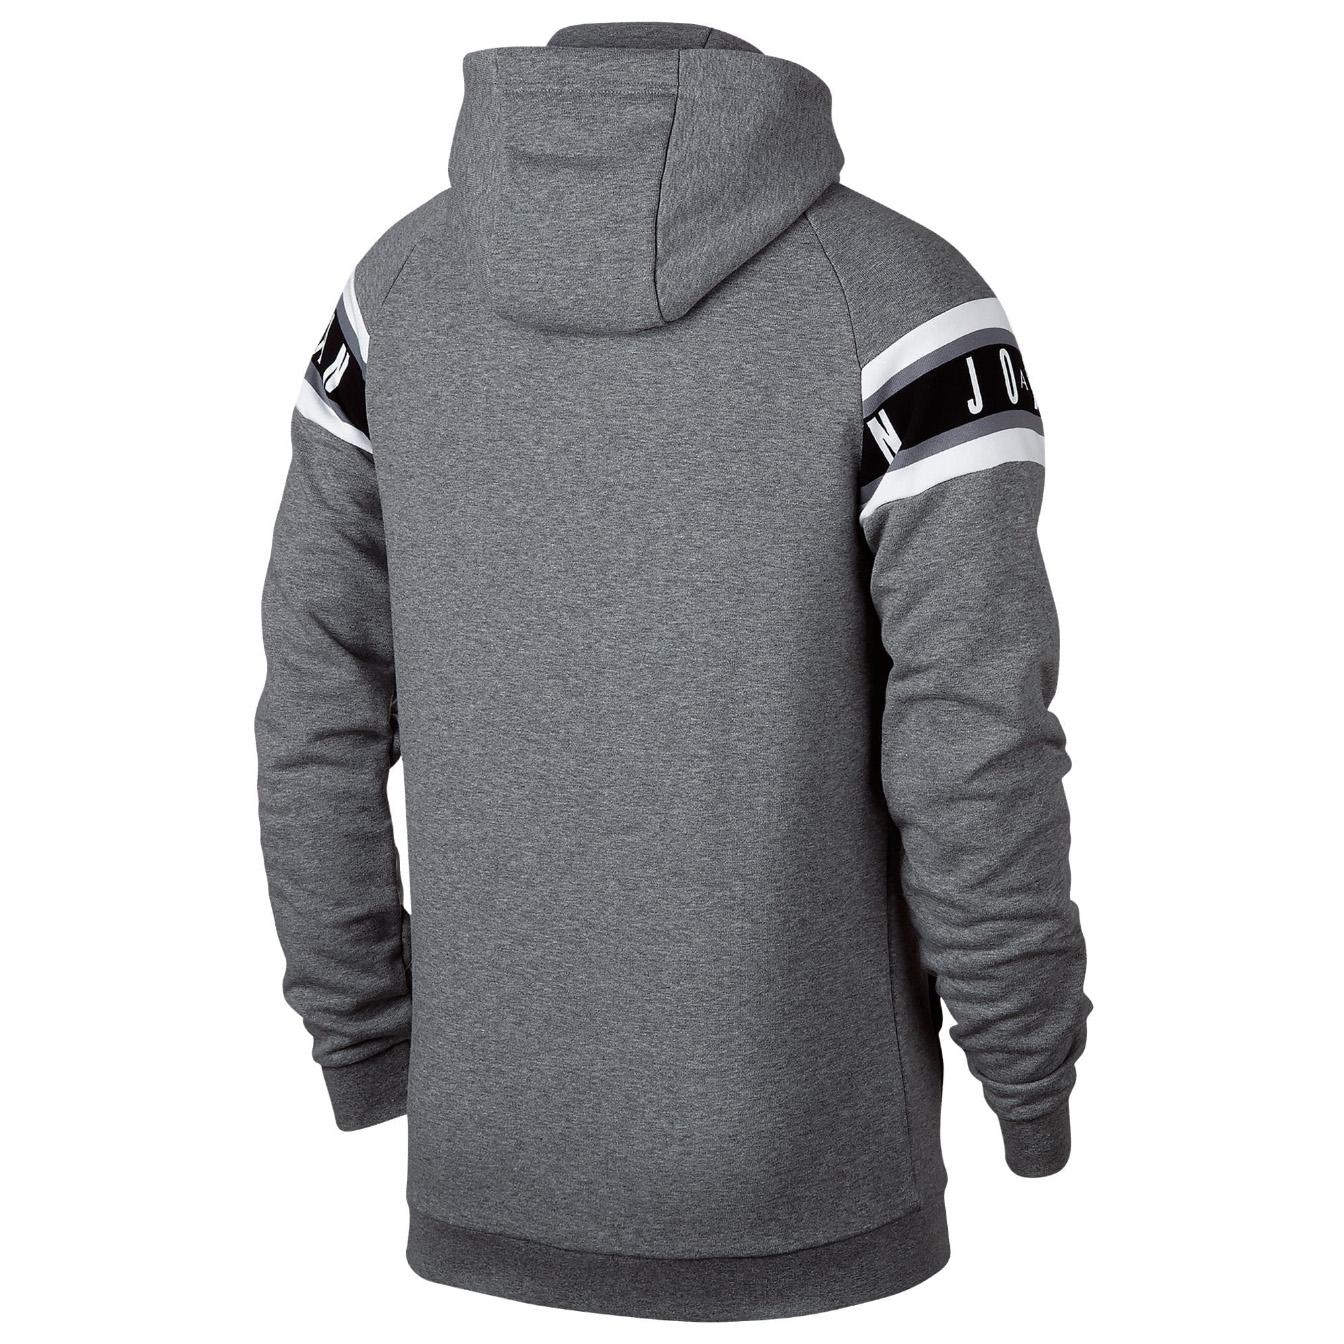 sale retailer 73834 cec3b Details about JORDAN Jumpman Air HBR Full-Zip Hoodie Sweatshirt Sweat Shirt  jumper fleece